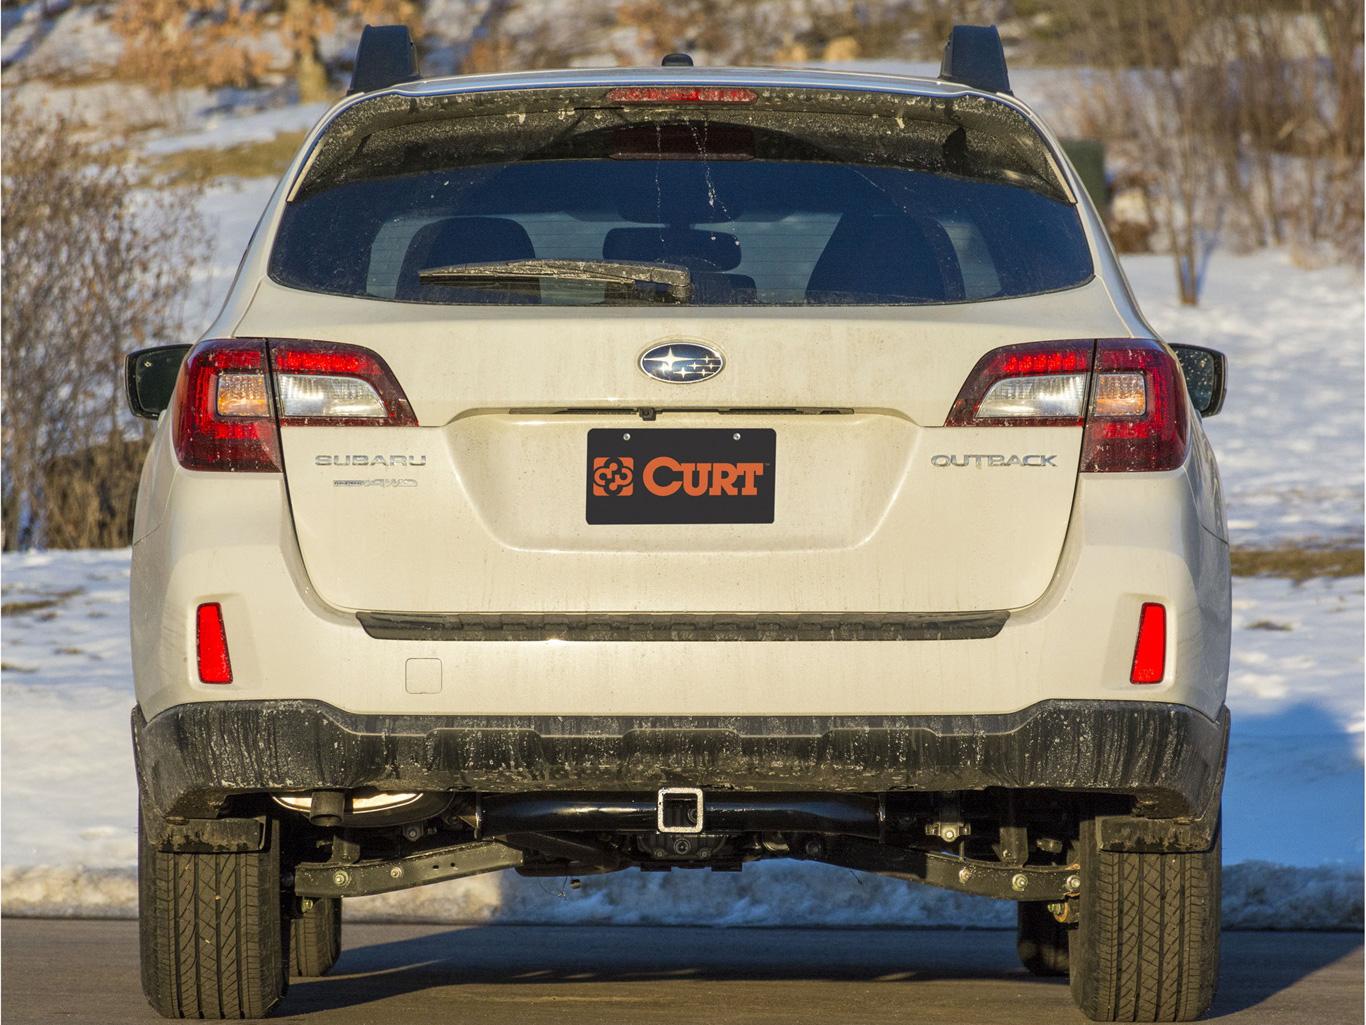 [ZHKZ_3066]  NH_7079] Subaru Outback Trailer Wiring Wiring Diagram | 2017 Subaru Outback Trailer Wiring Harness |  | Eumqu Embo Vish Ungo Sapebe Mohammedshrine Librar Wiring 101